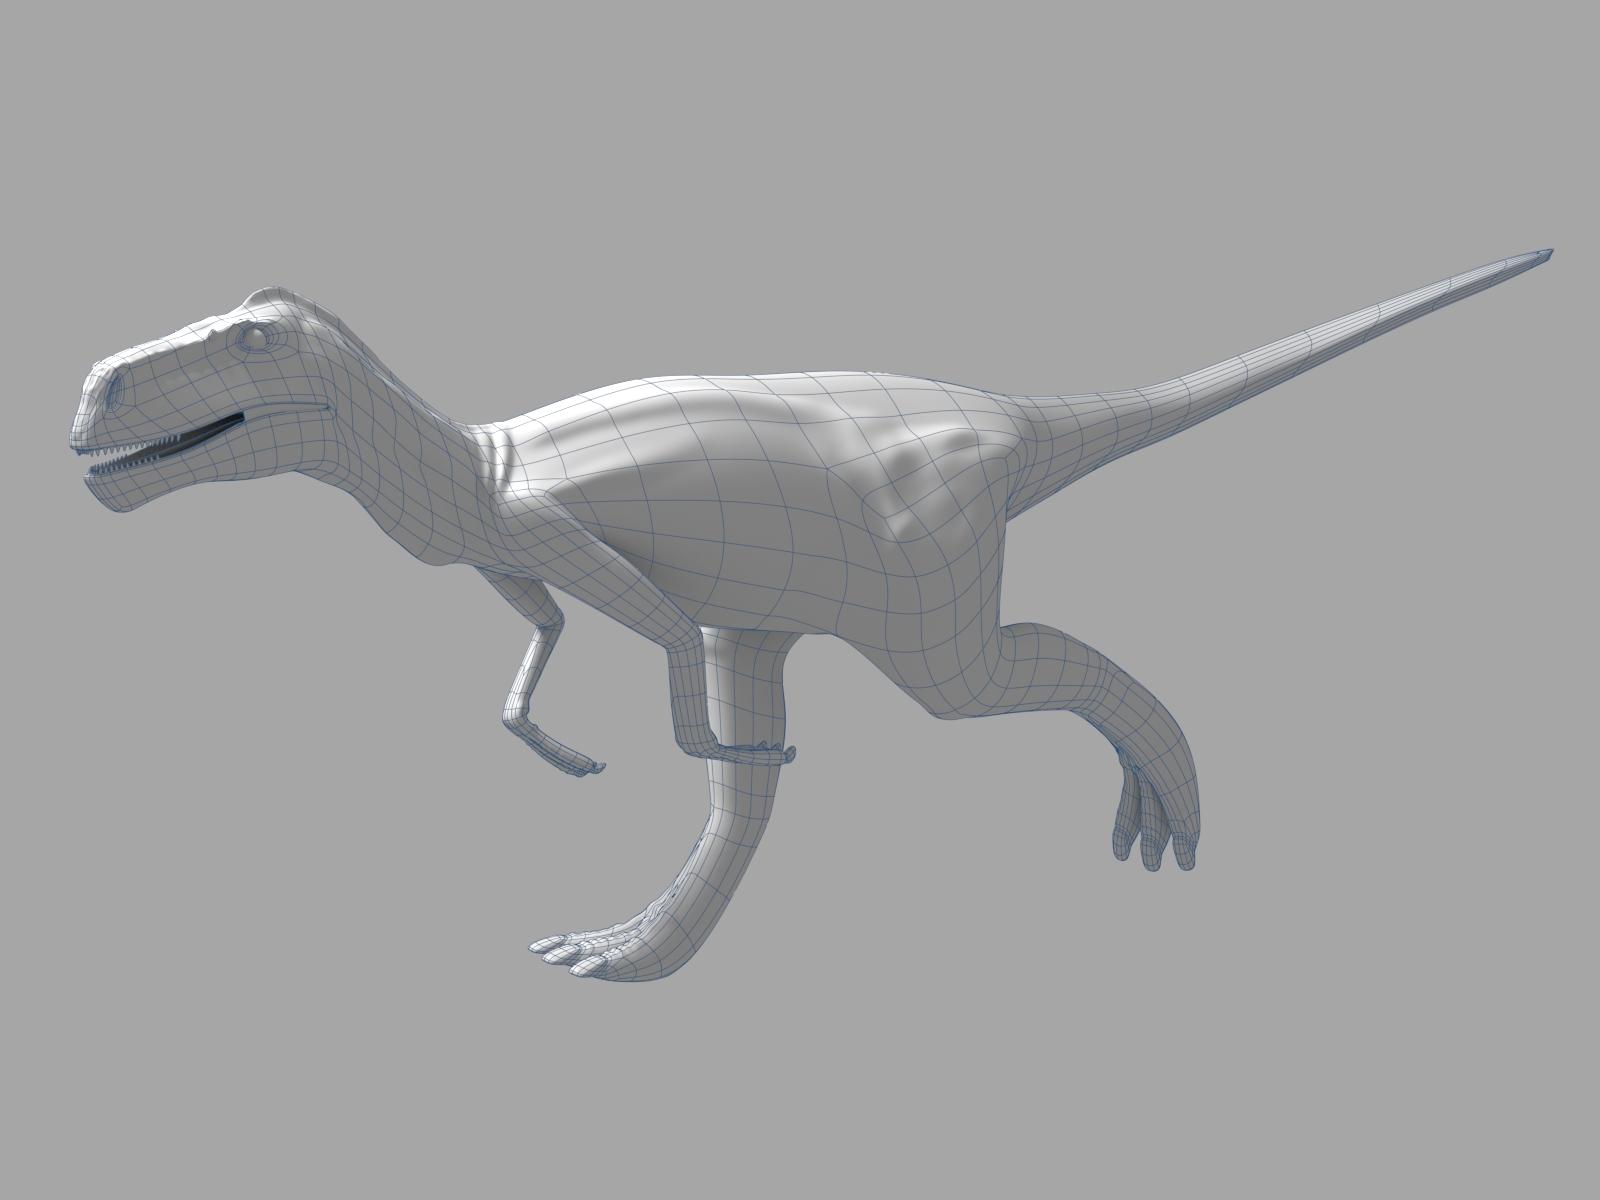 dinosauro_wire.jpg.bf42f4ba309b97b30b3ce72c0d65d14e.jpg